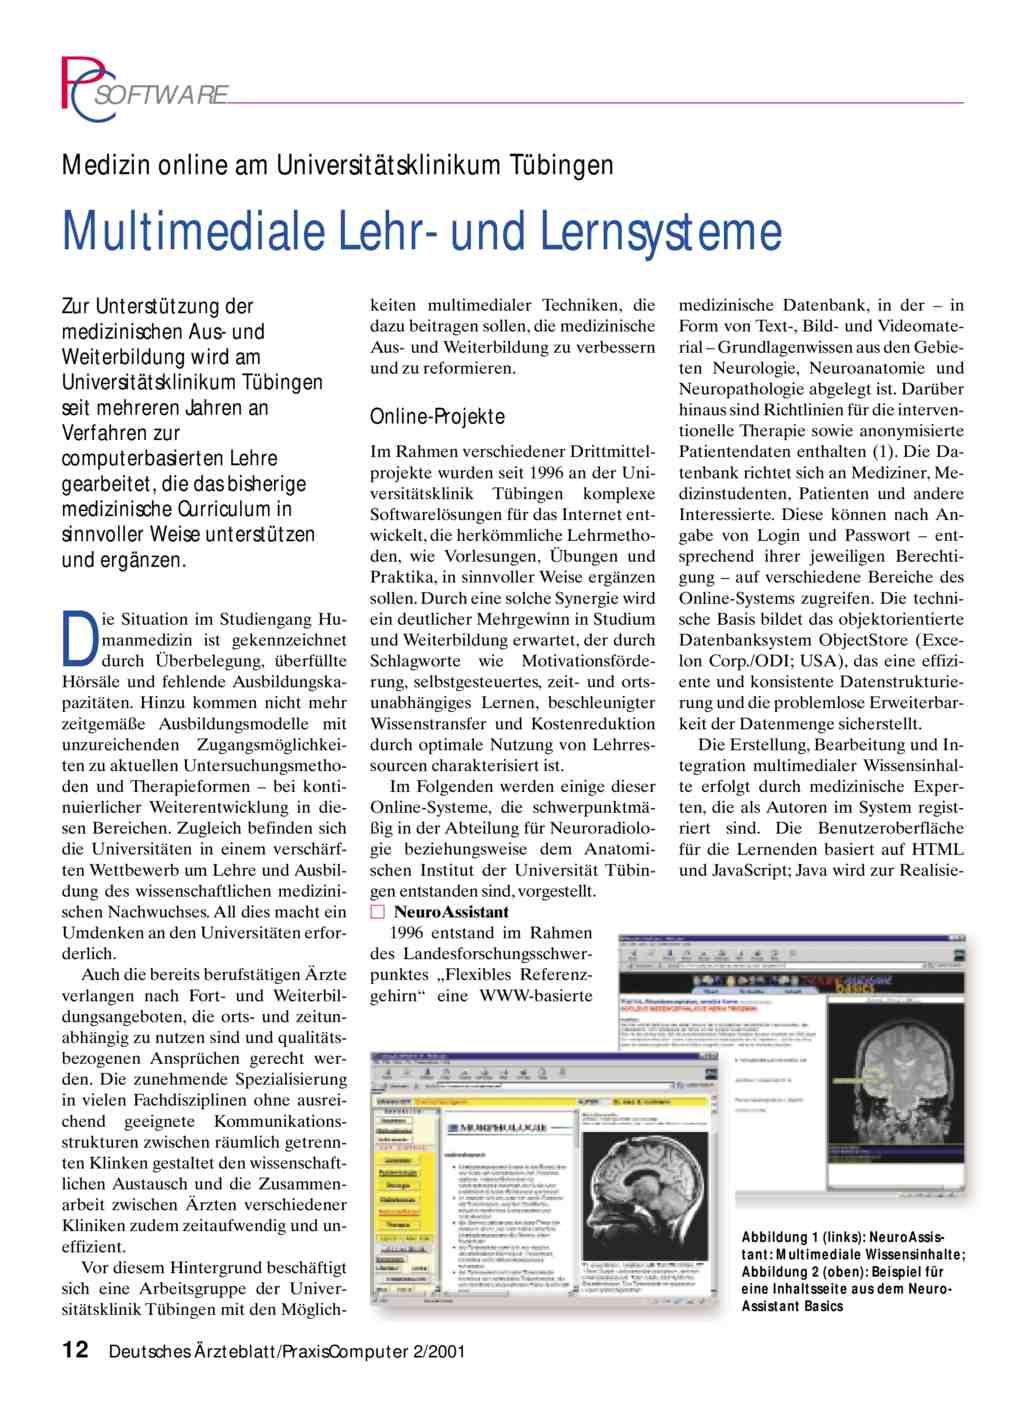 Medizin online am Universitätsklinikum Tübingen: Multimediale Lehr ...